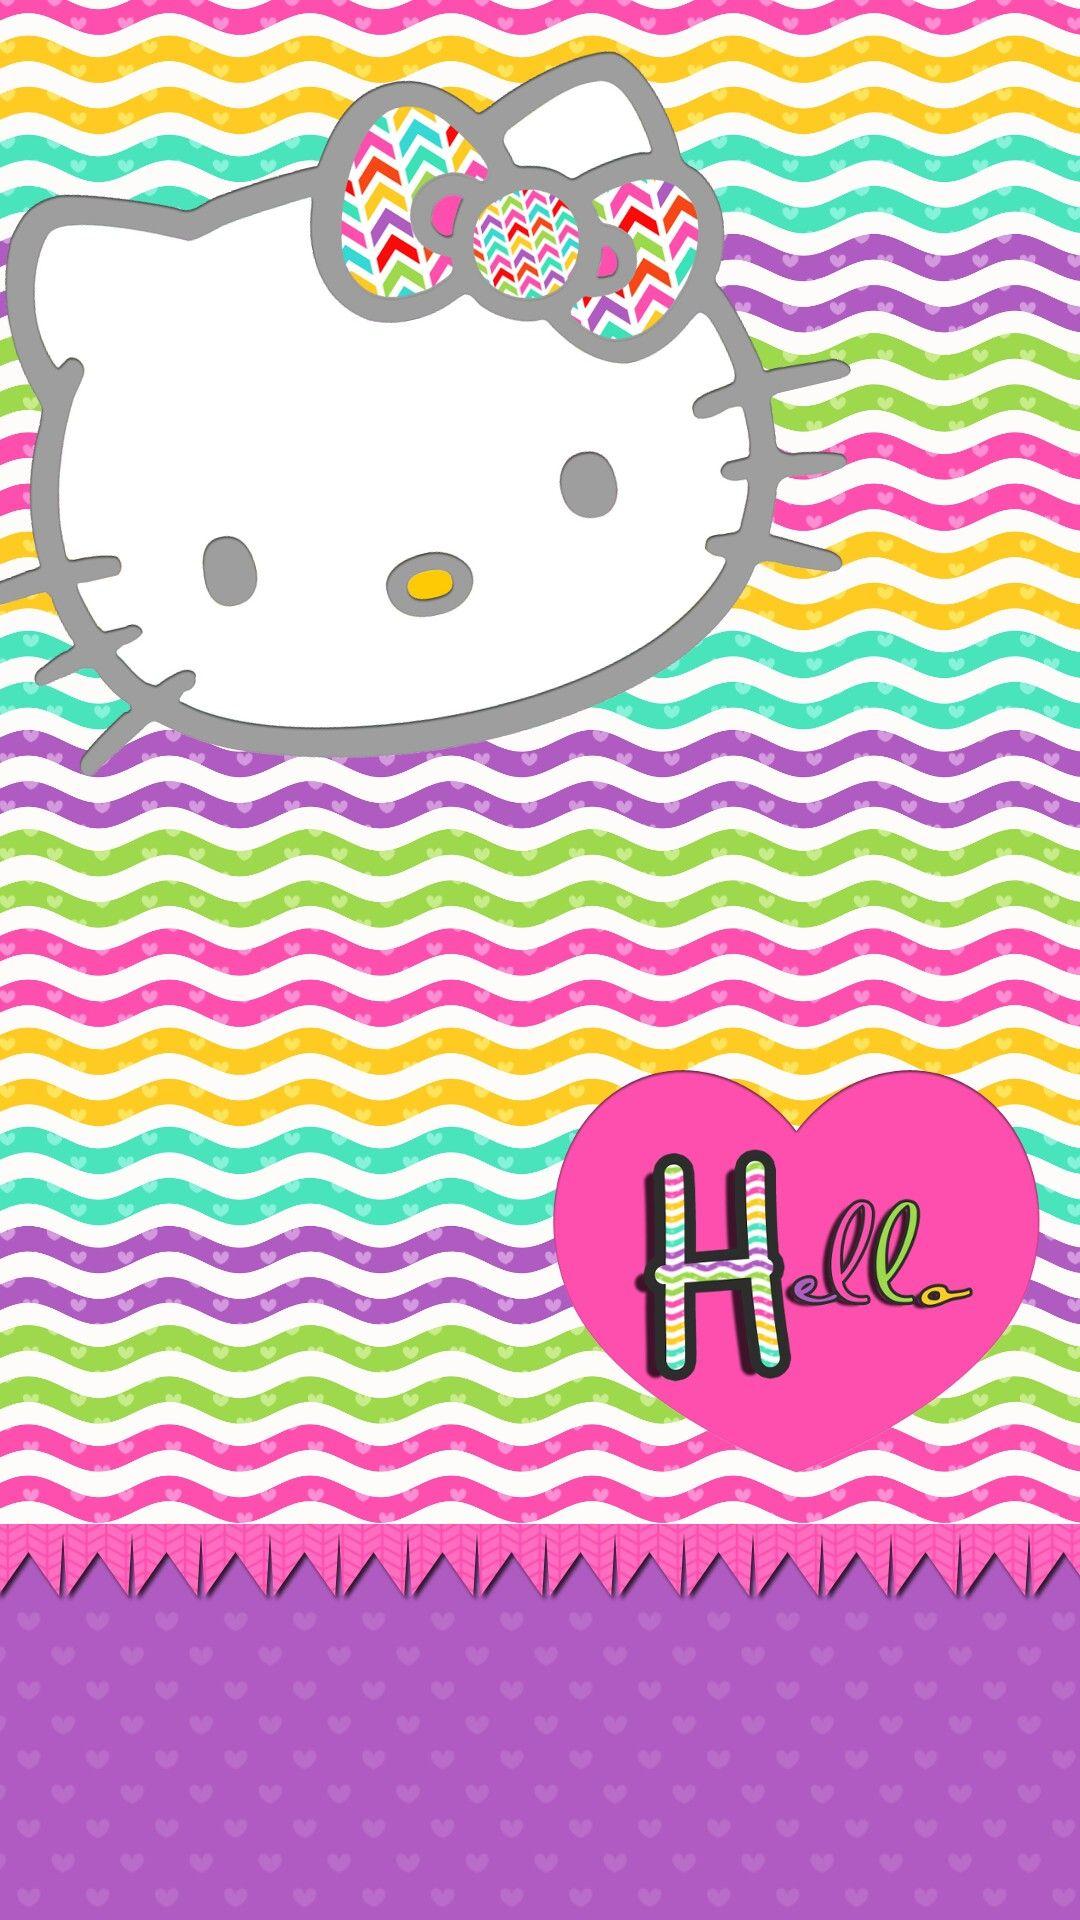 Simple Wallpaper Hello Kitty Desktop Background - bab9fe1db4994bdf0b74d0baea8515ec  Collection_292718.jpg